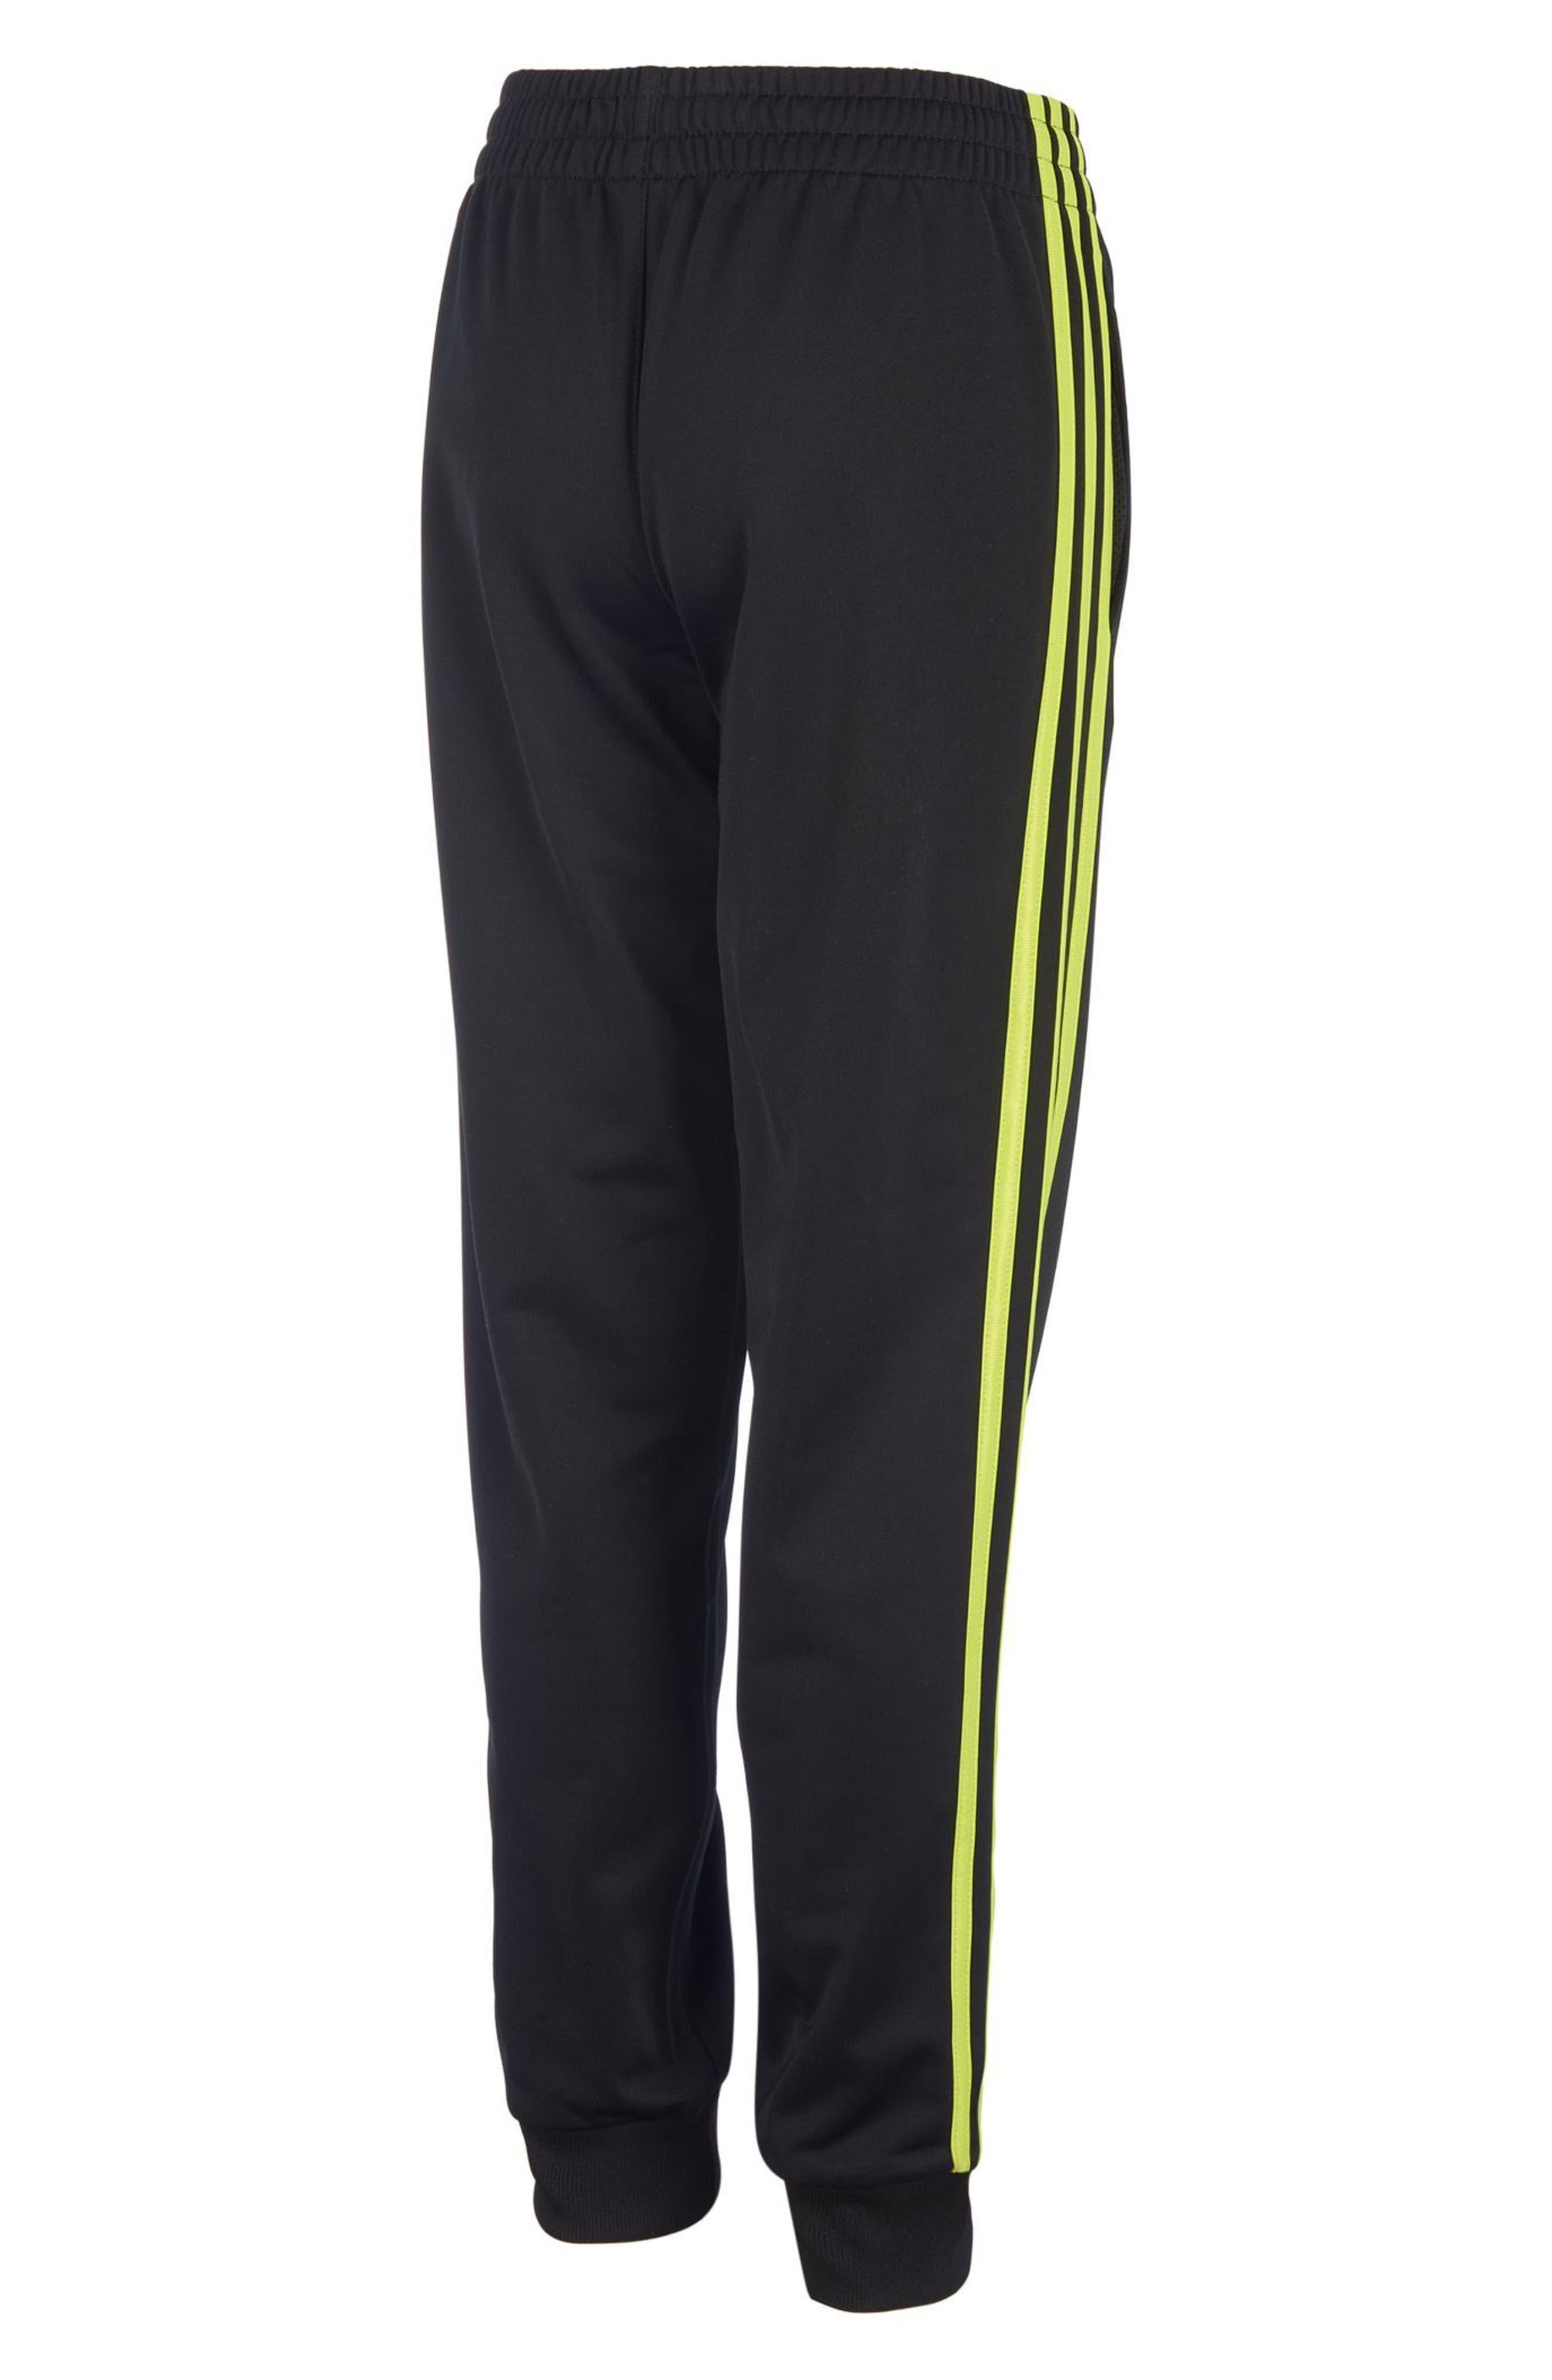 Iconic Jogger Pants,                             Alternate thumbnail 2, color,                             Black/ Yellow